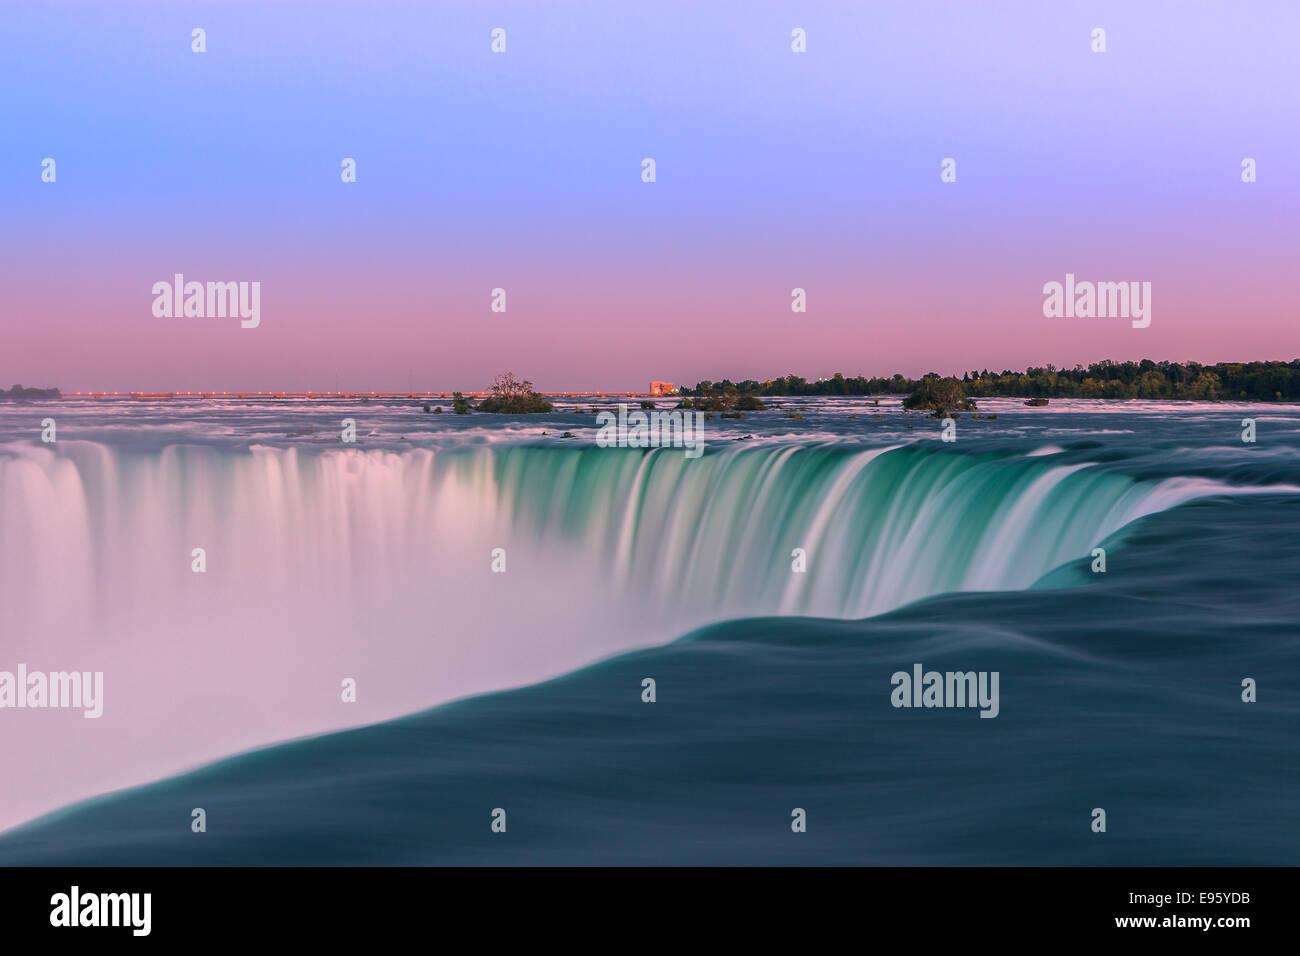 Horseshoe Falls bei Sonnenuntergang, Teil der Niagarafälle, Ontario, Kanada. Stockbild